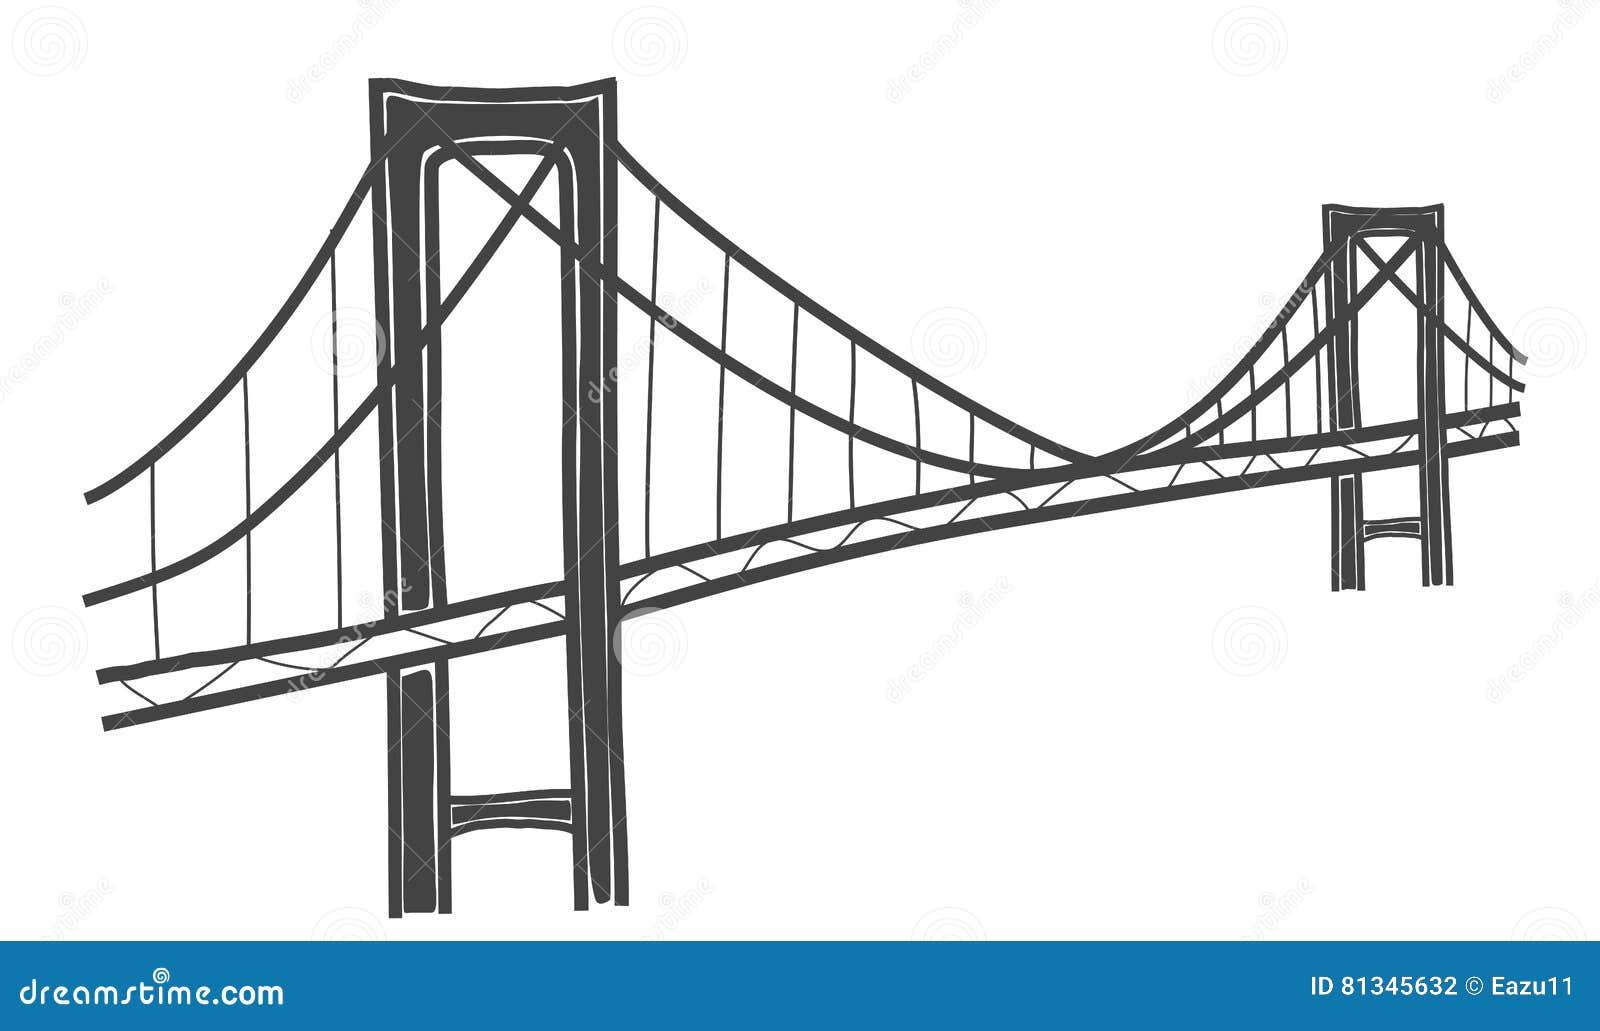 rainbow bridge tokyo drawing stock illustration